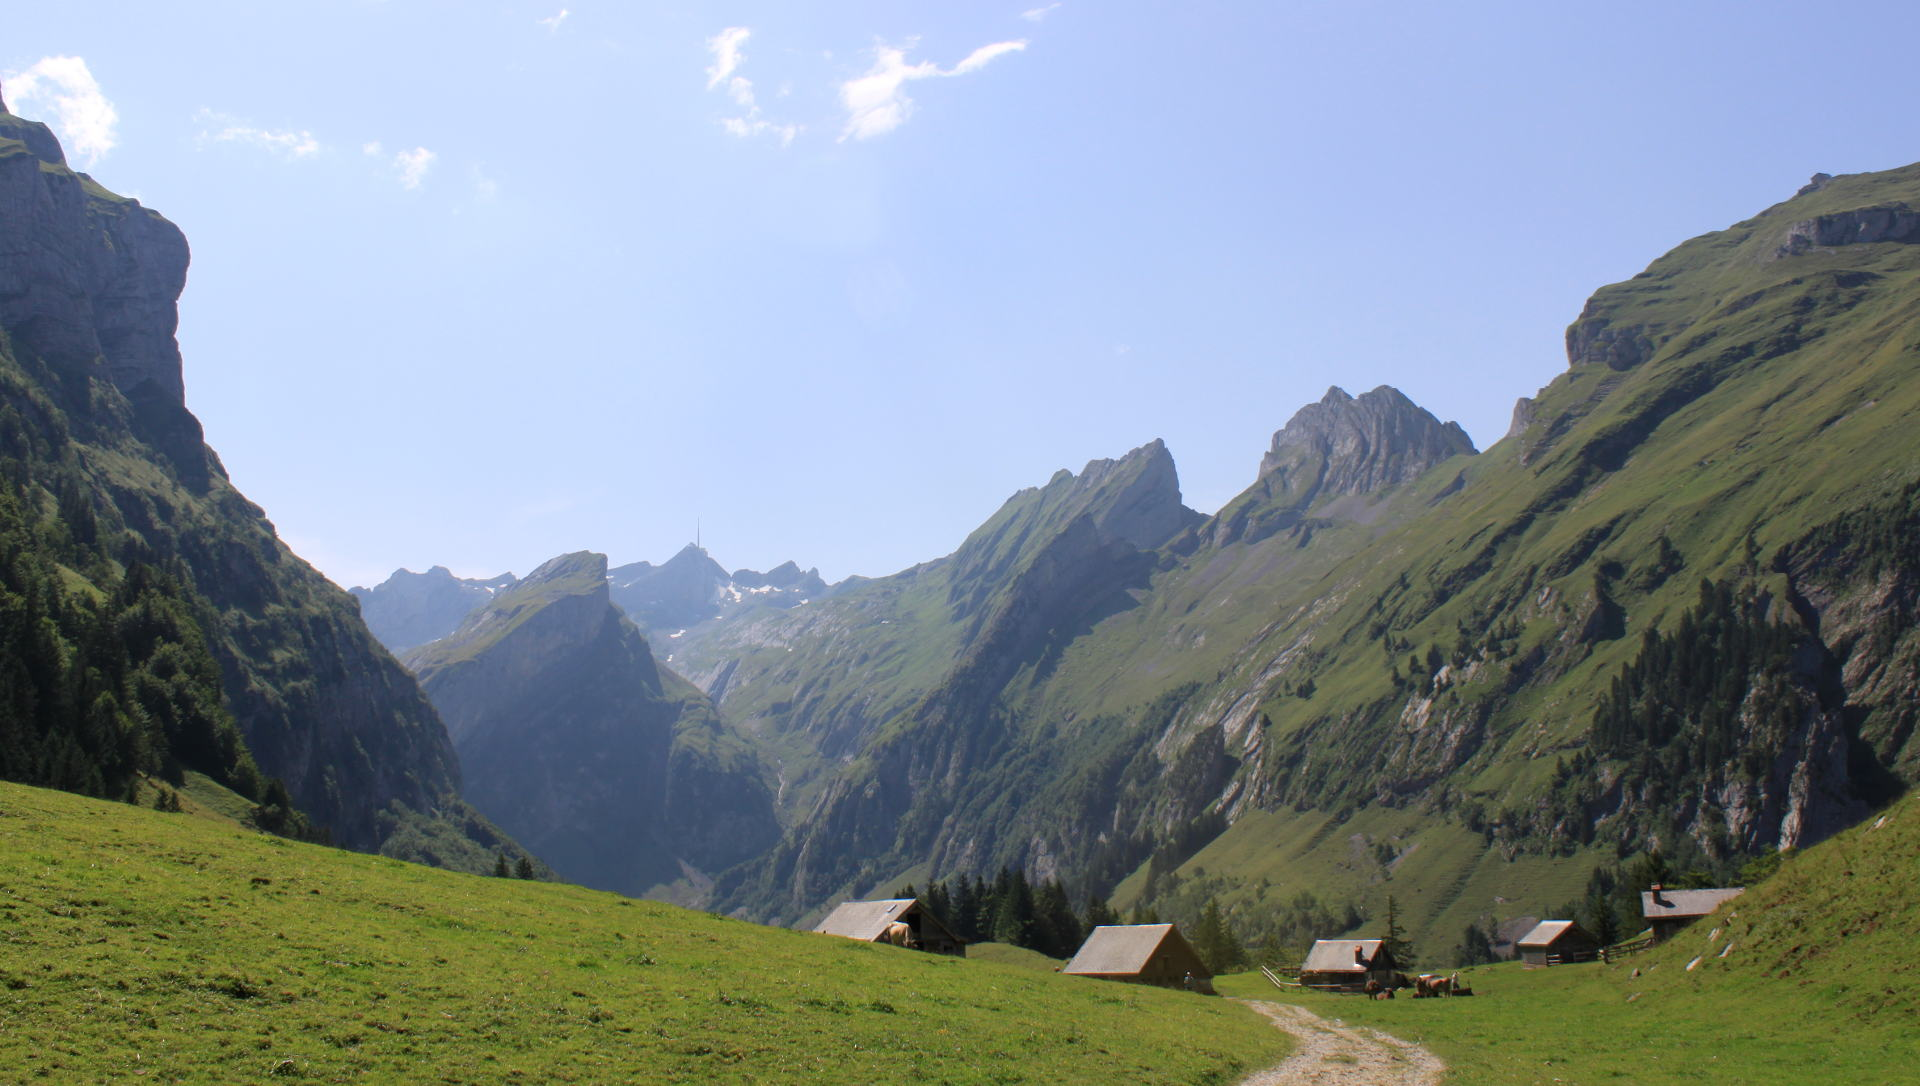 szwajcaria seealpsee alpy natura iglawpodrozy